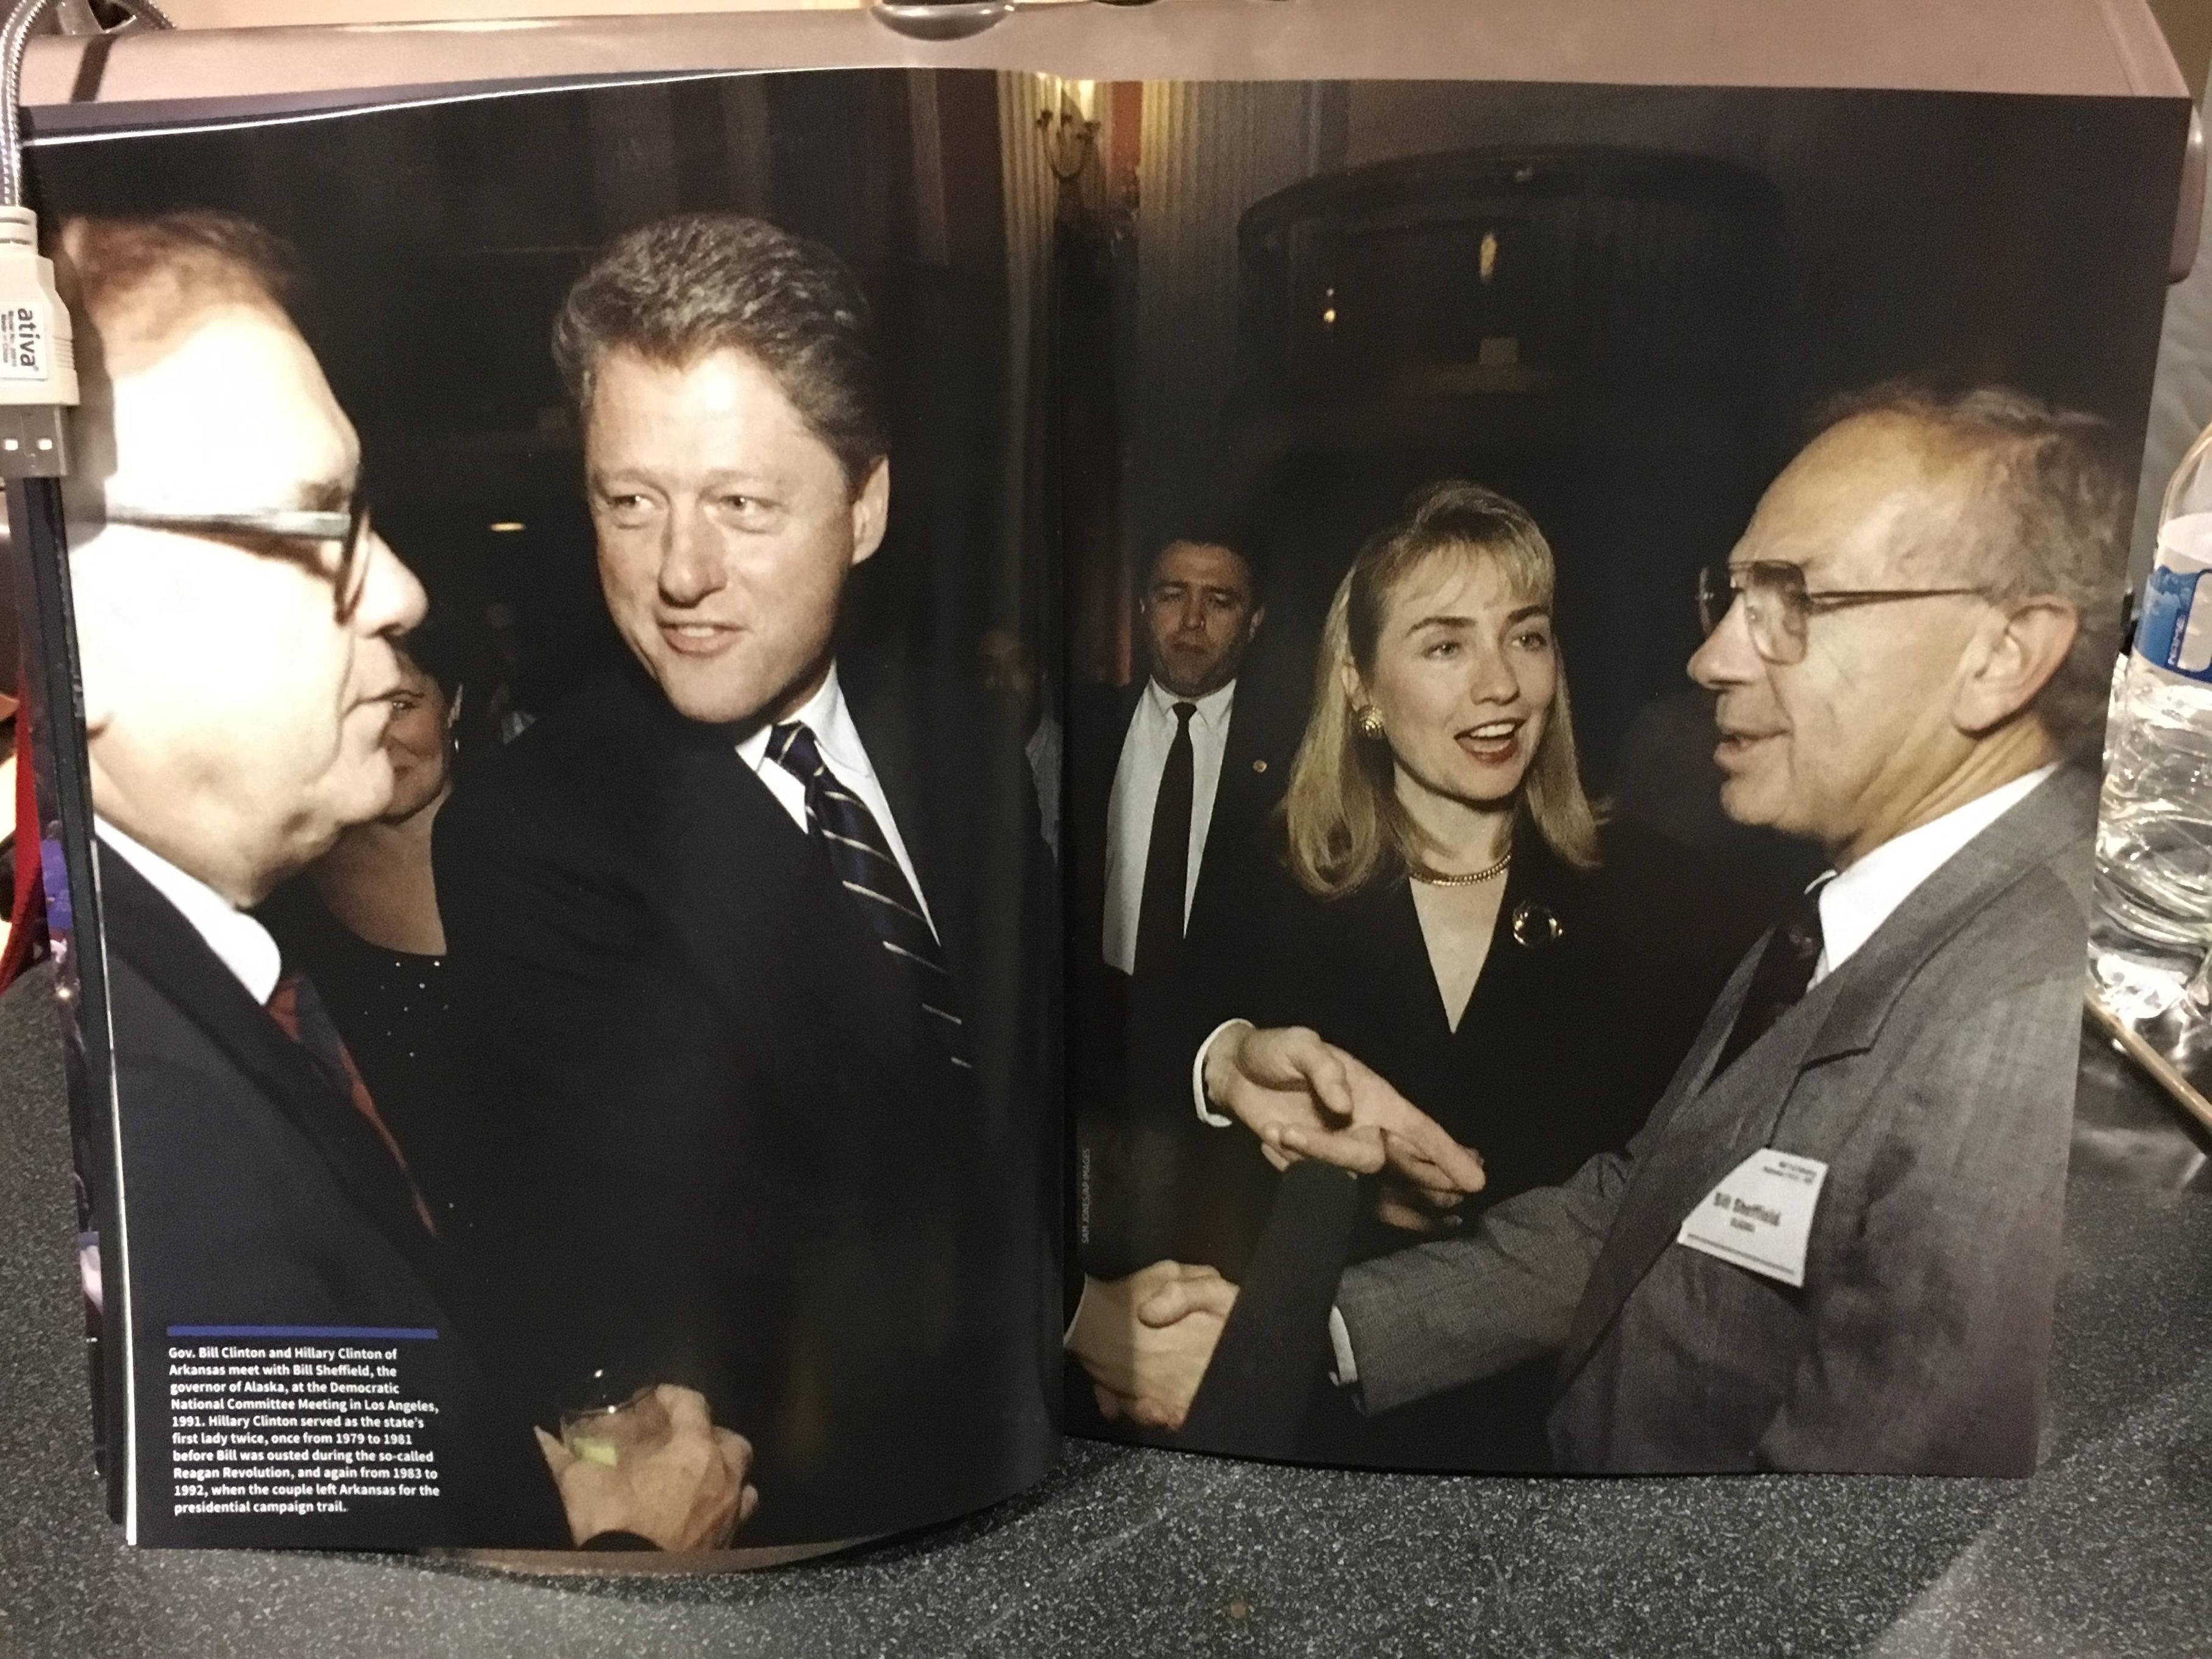 newsweek-madame-hillary-clinton-page-7